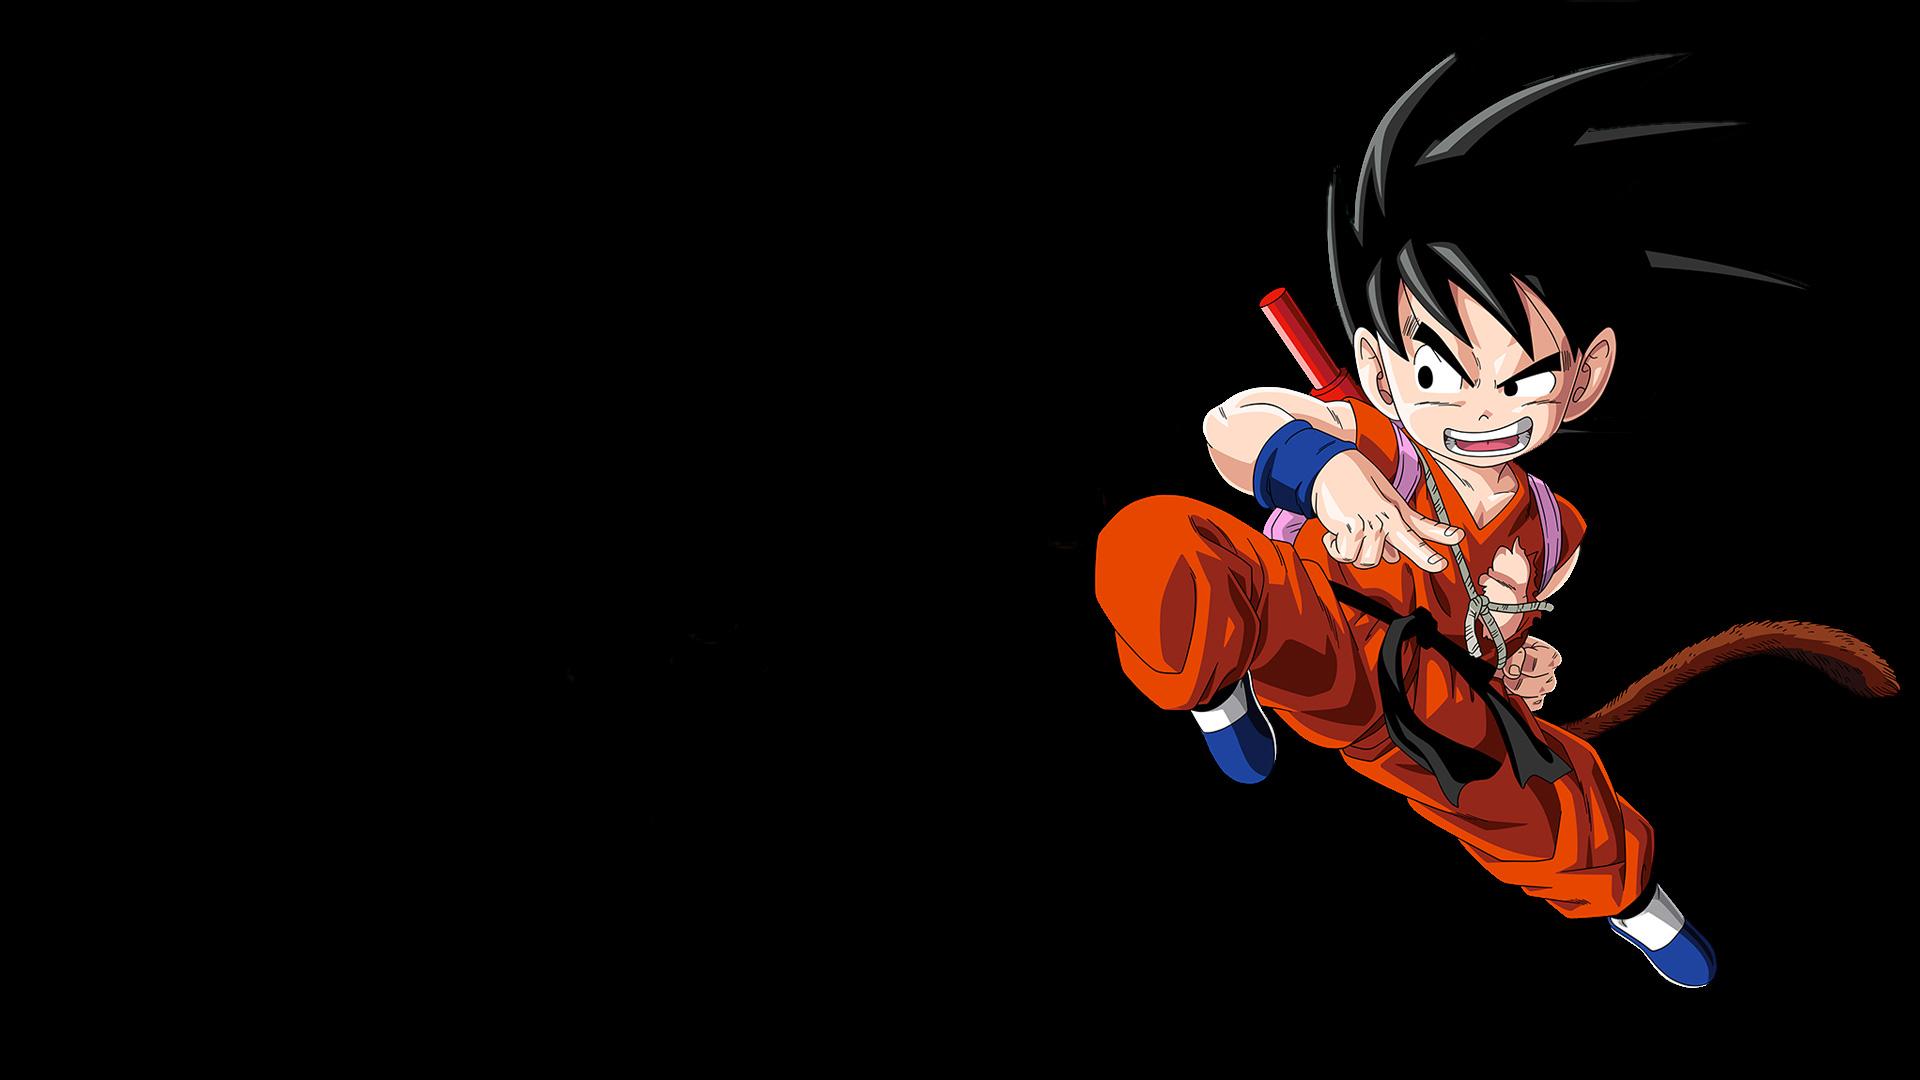 40 Best Goku Wallpaper hd for PC Dragon Ball Z 1920x1080